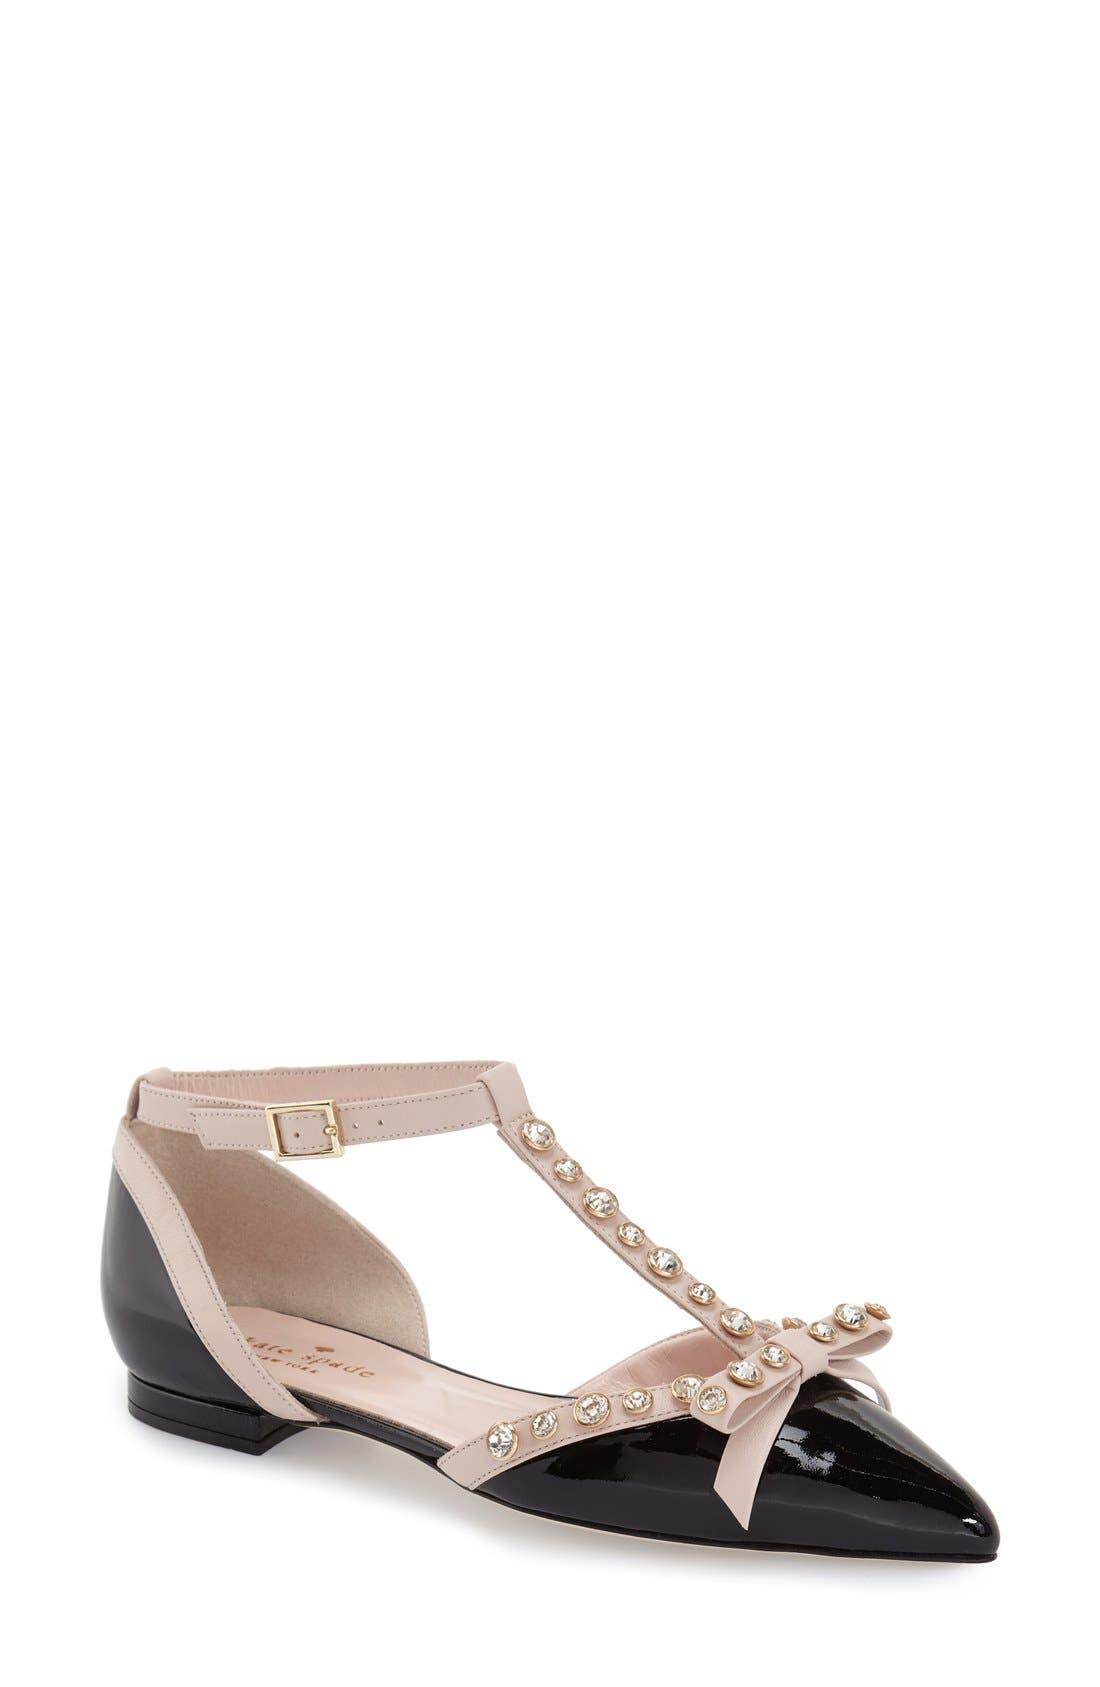 Main Image - kate spade new york 'becca' t-strap sandal (women)